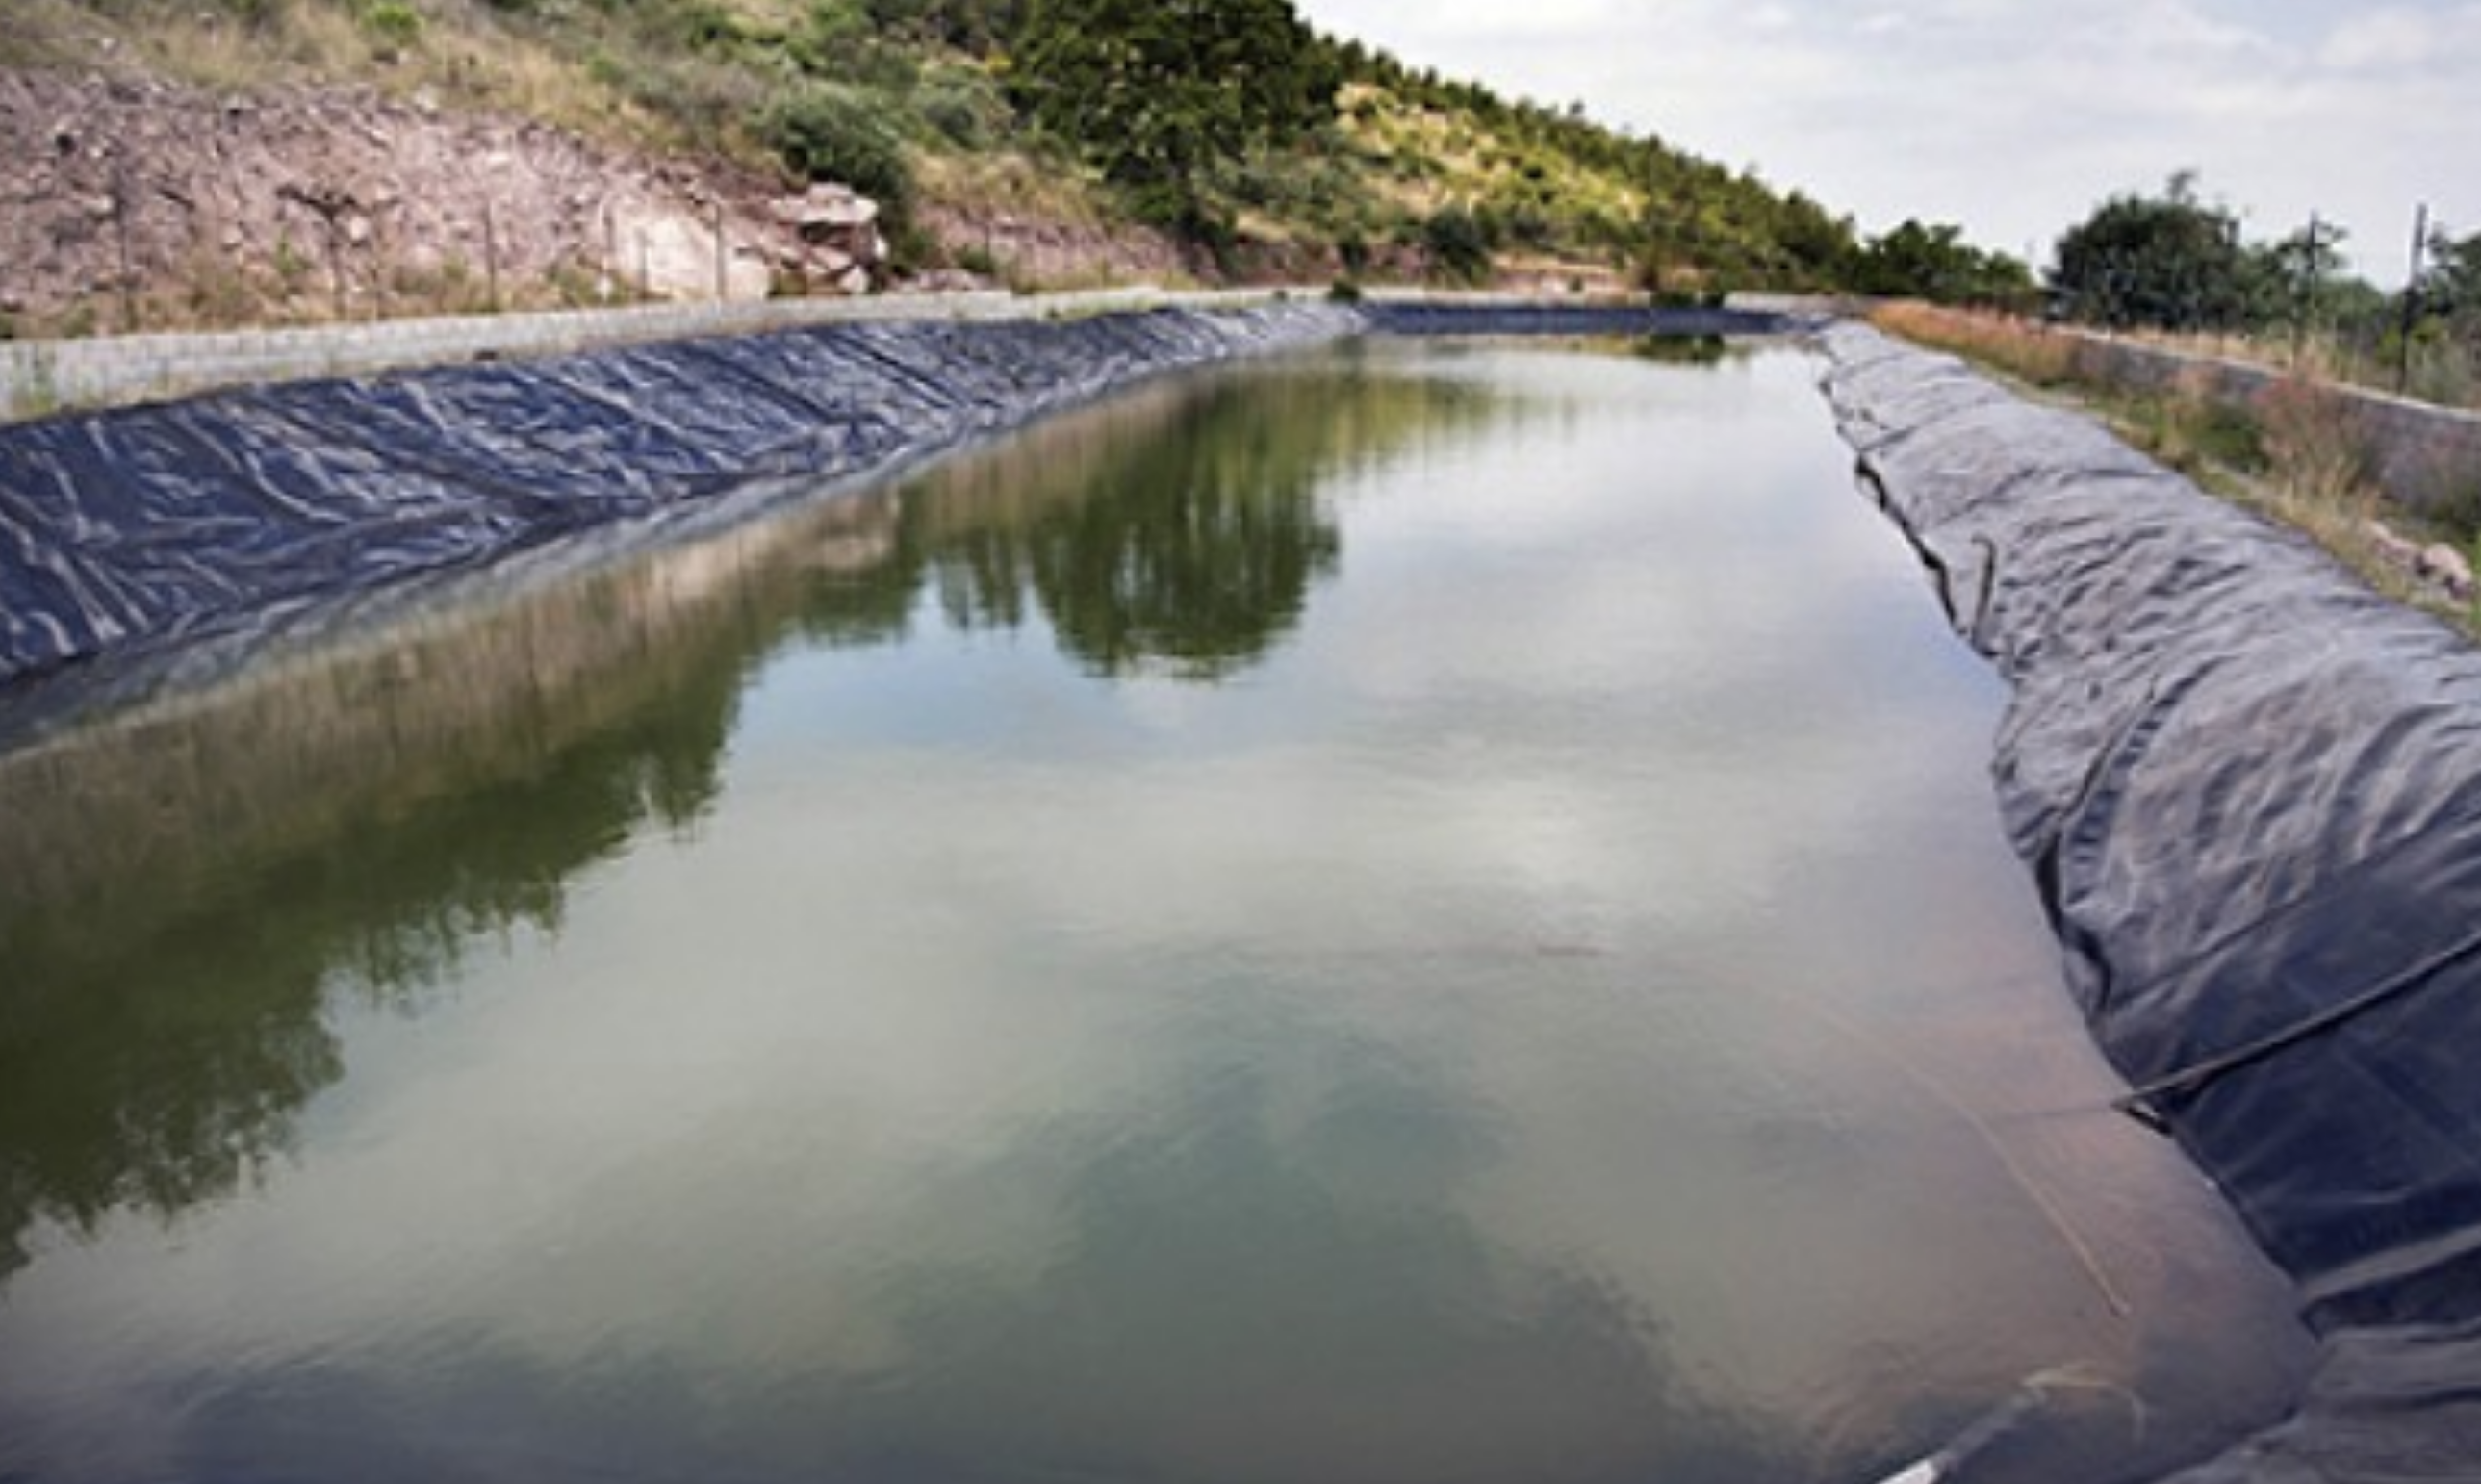 México: Decisión de AMLO de acabar con robo de agua es benéfico para todos: Víctor Quintana (El Digital)